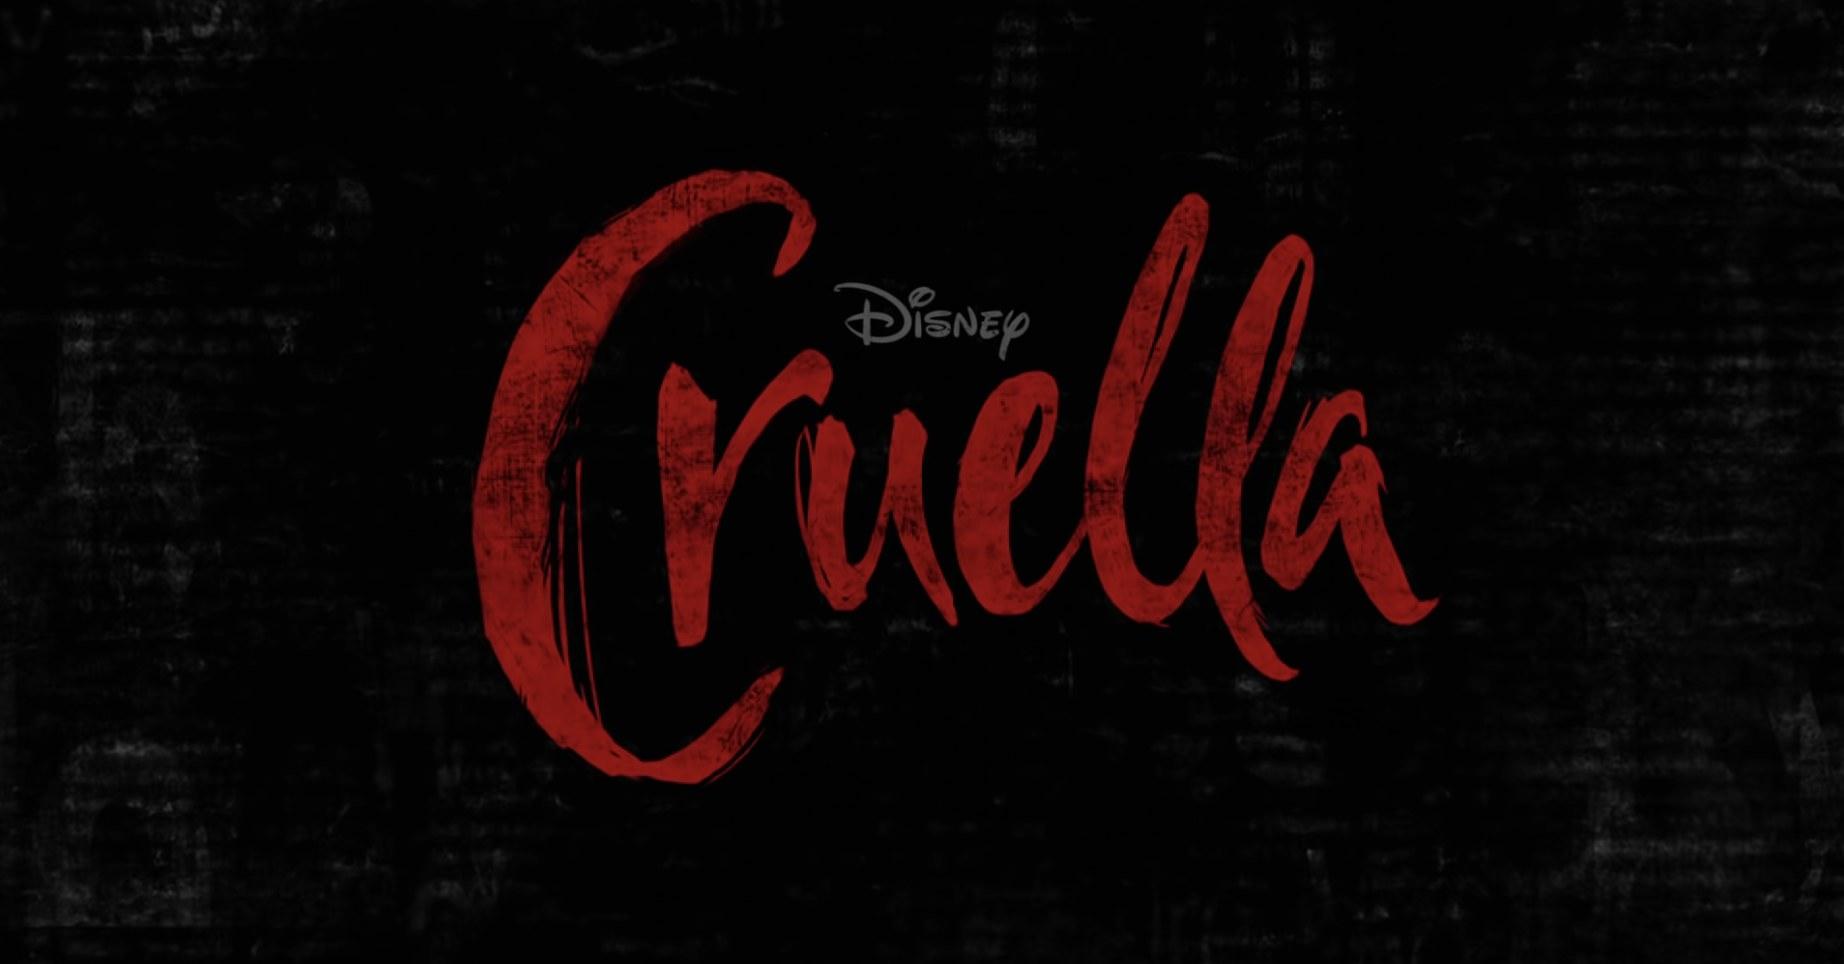 Cruella logo in the first official trailer